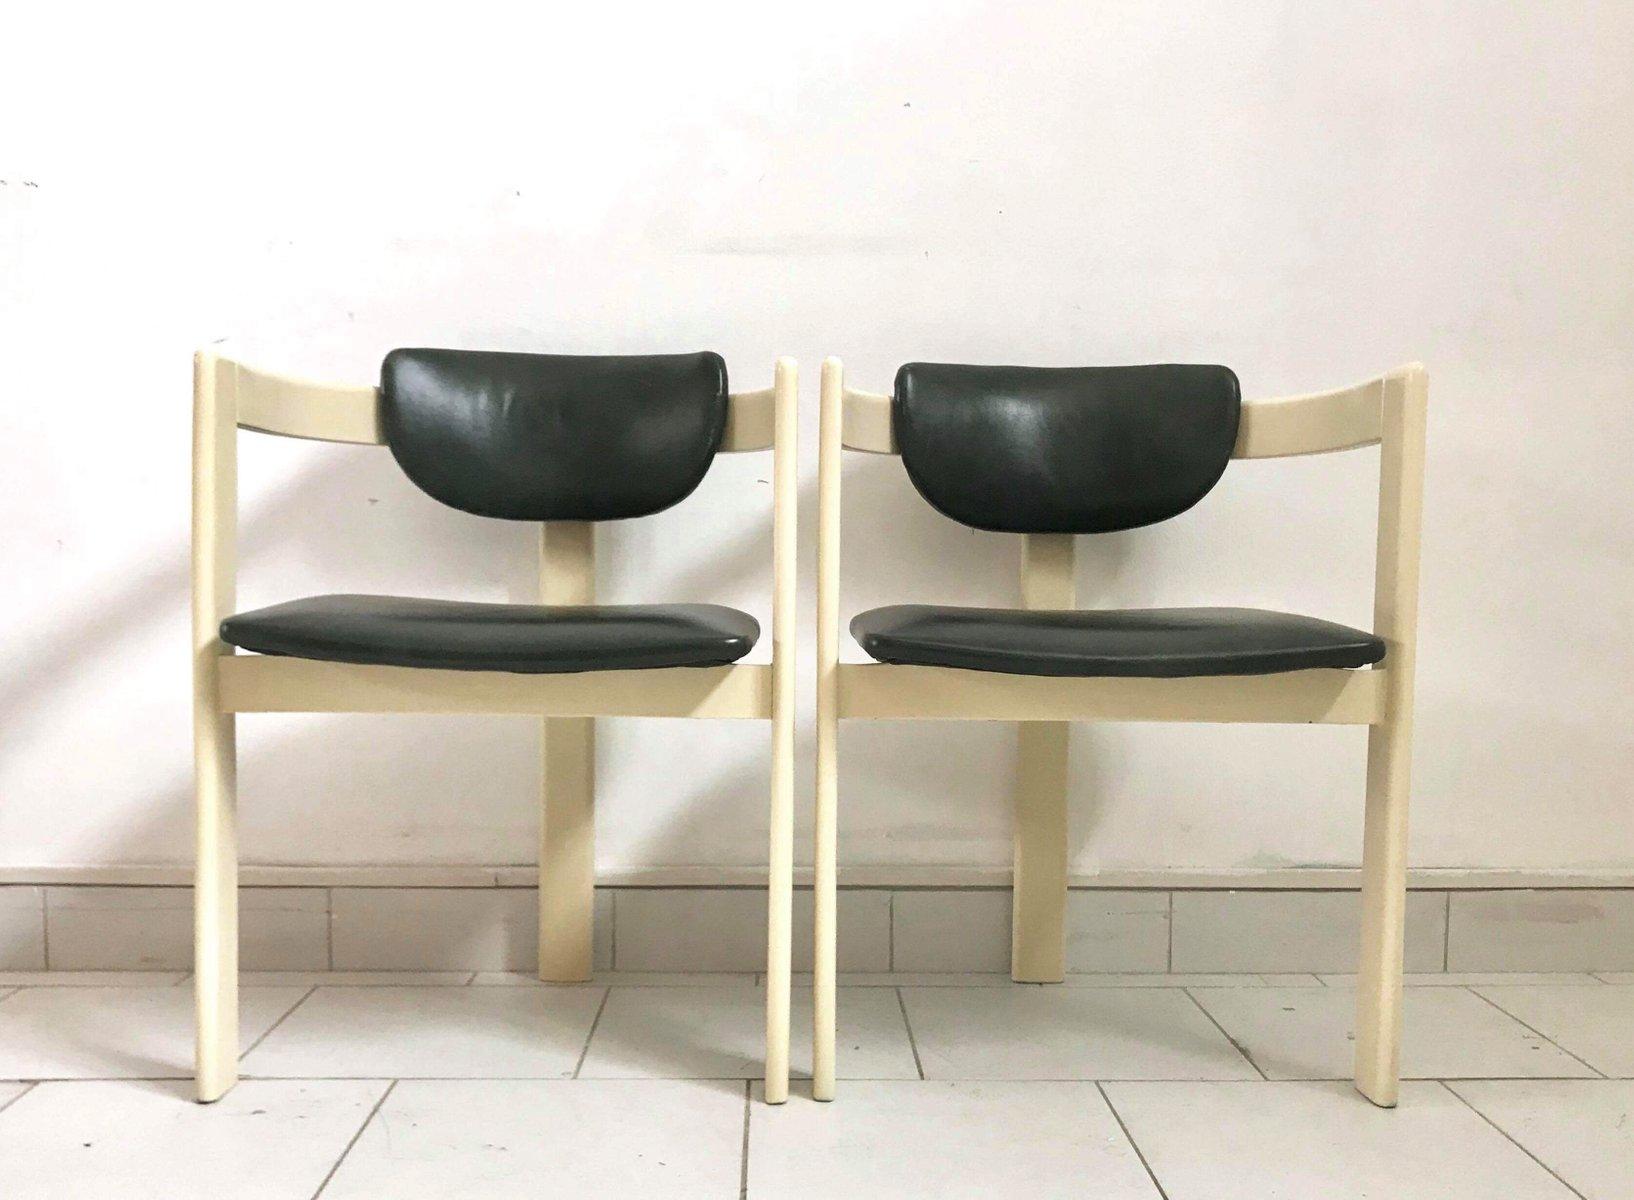 space age dreibein st hle 1970er 4er set bei pamono kaufen. Black Bedroom Furniture Sets. Home Design Ideas